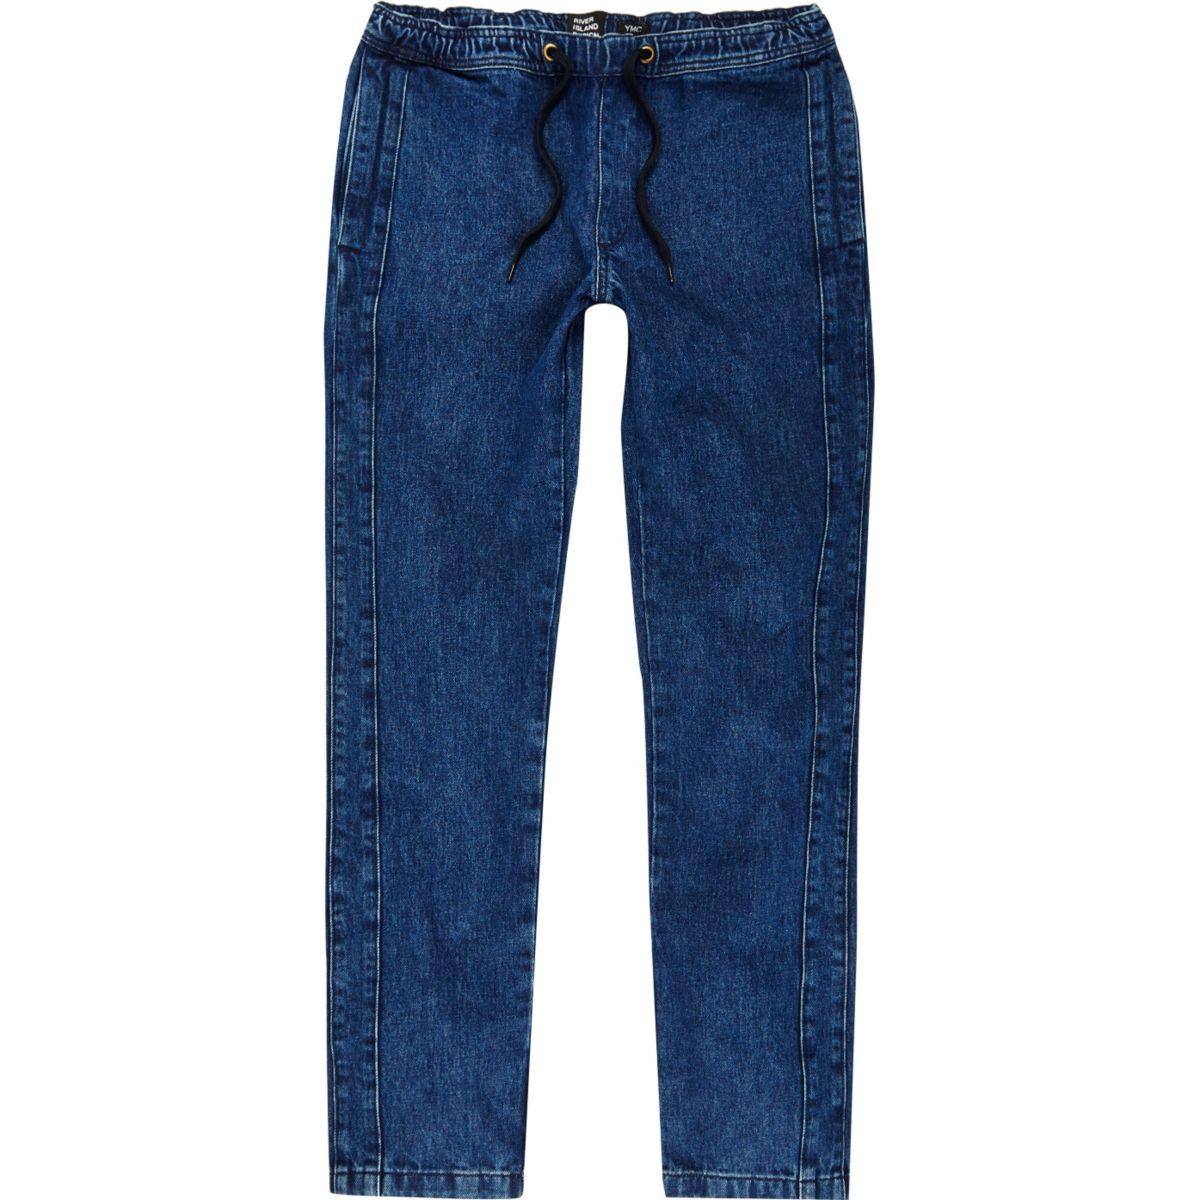 YMC – Blaue Jeans-Jogginghose